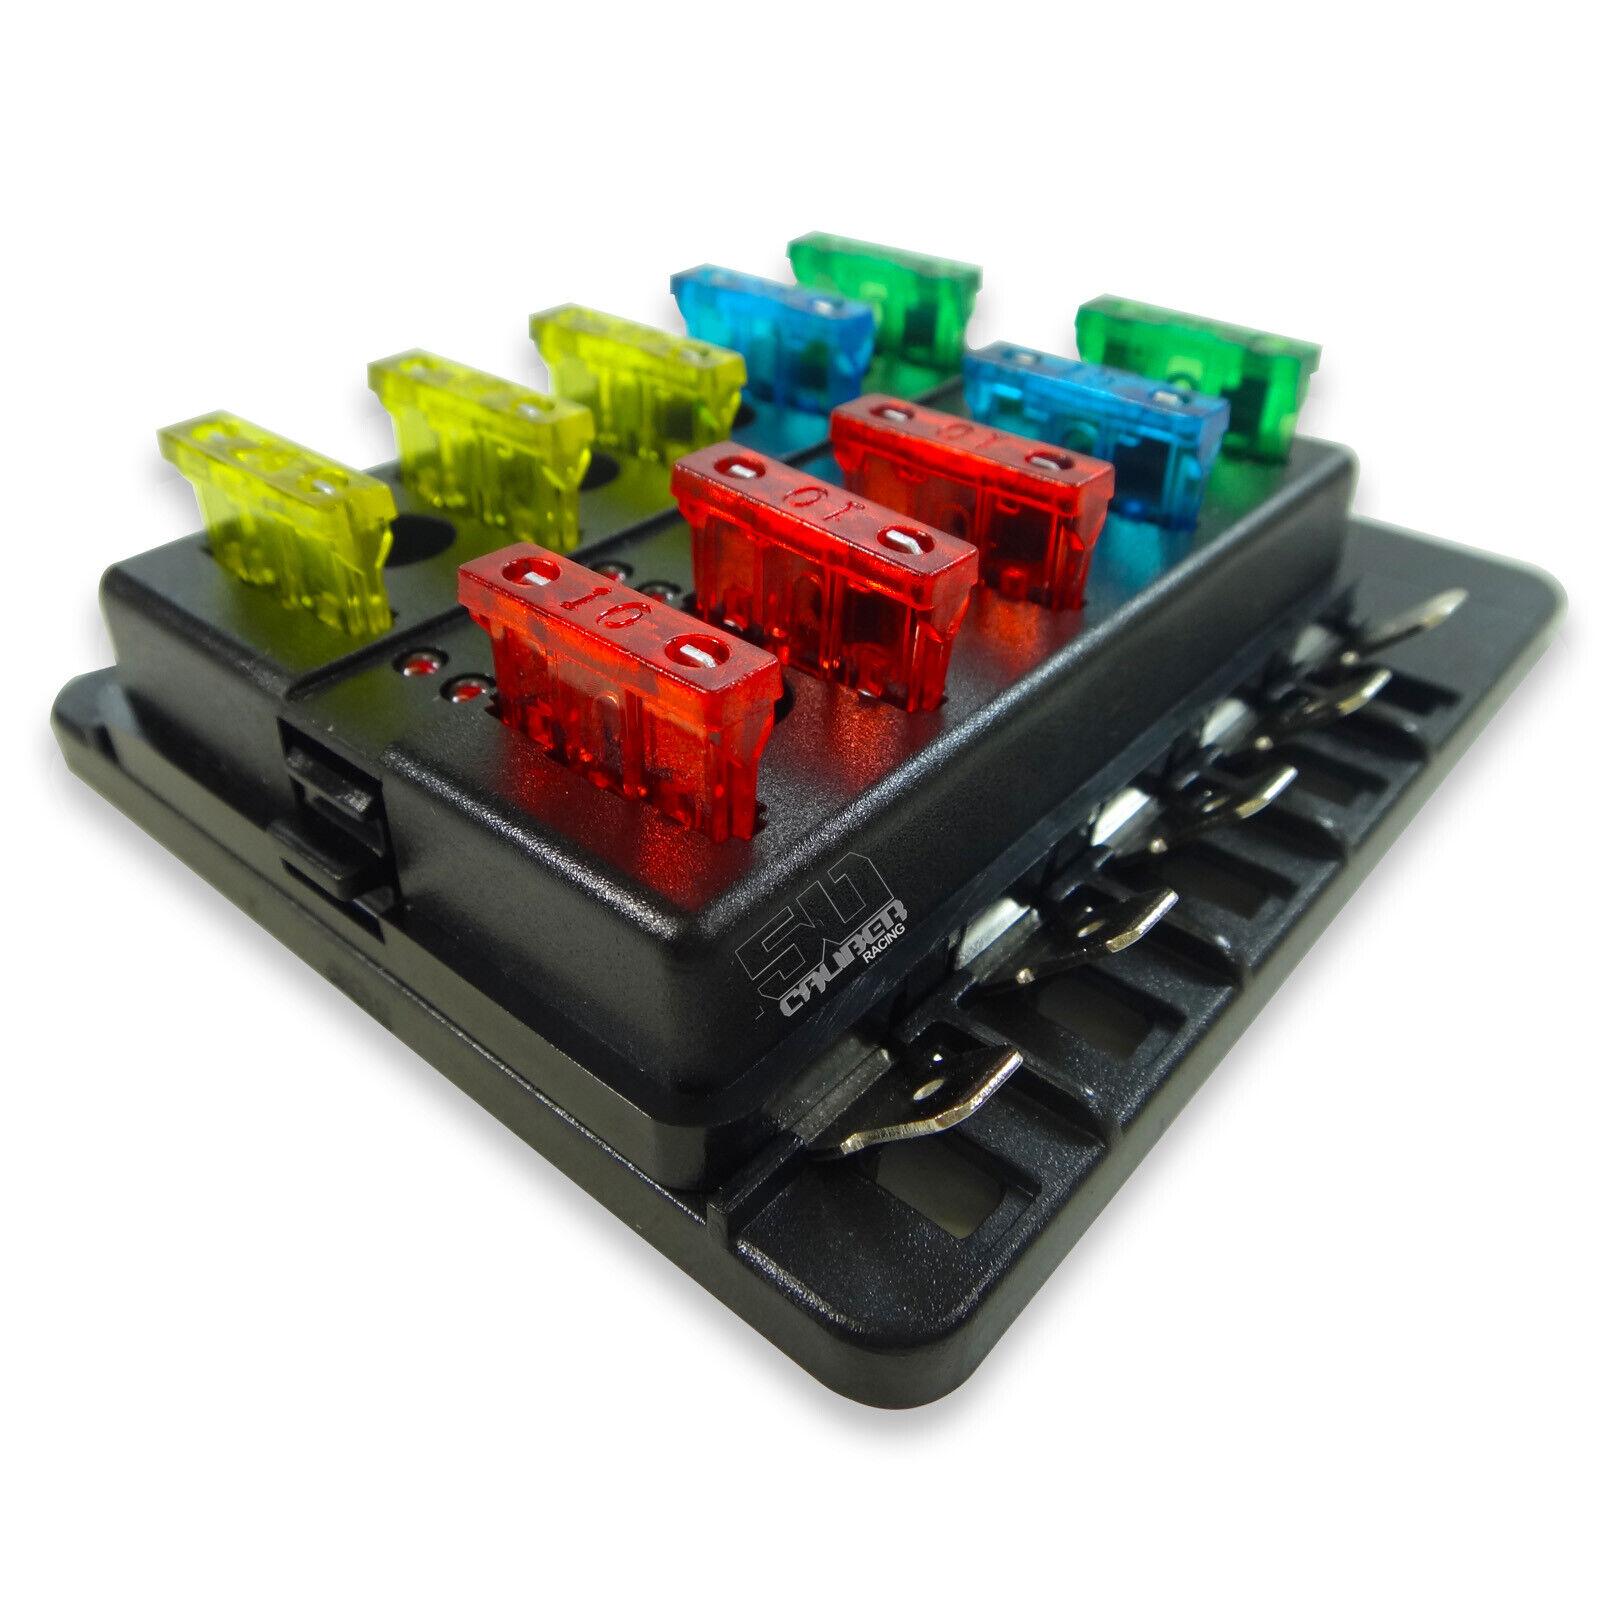 10Way 12V Blade Fuse Box Distribution Block Kit LED RZR Wildcat Rhino Viking X3